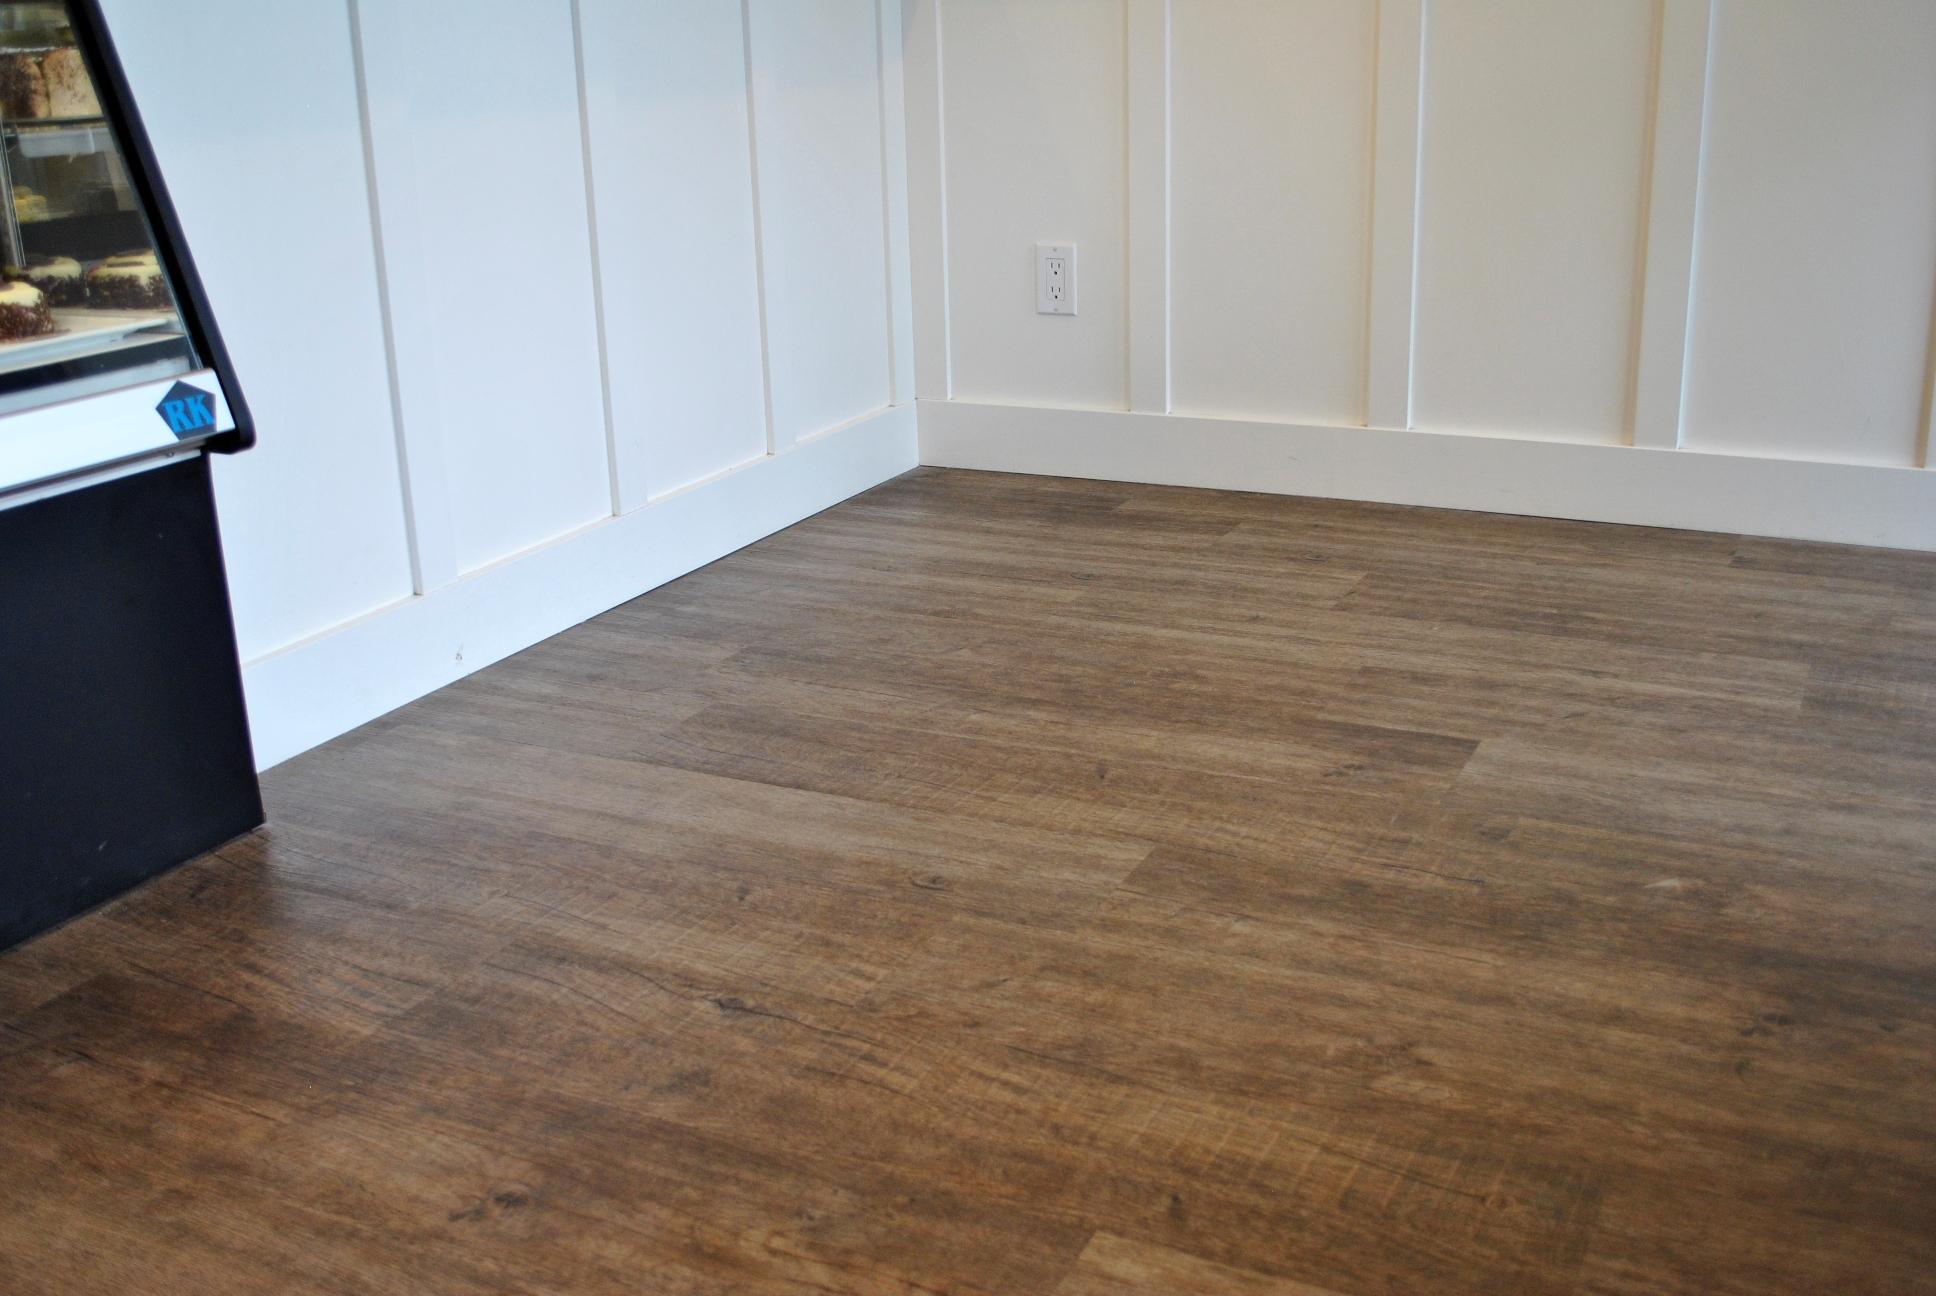 VinylCork Floors by Eco Floor Store